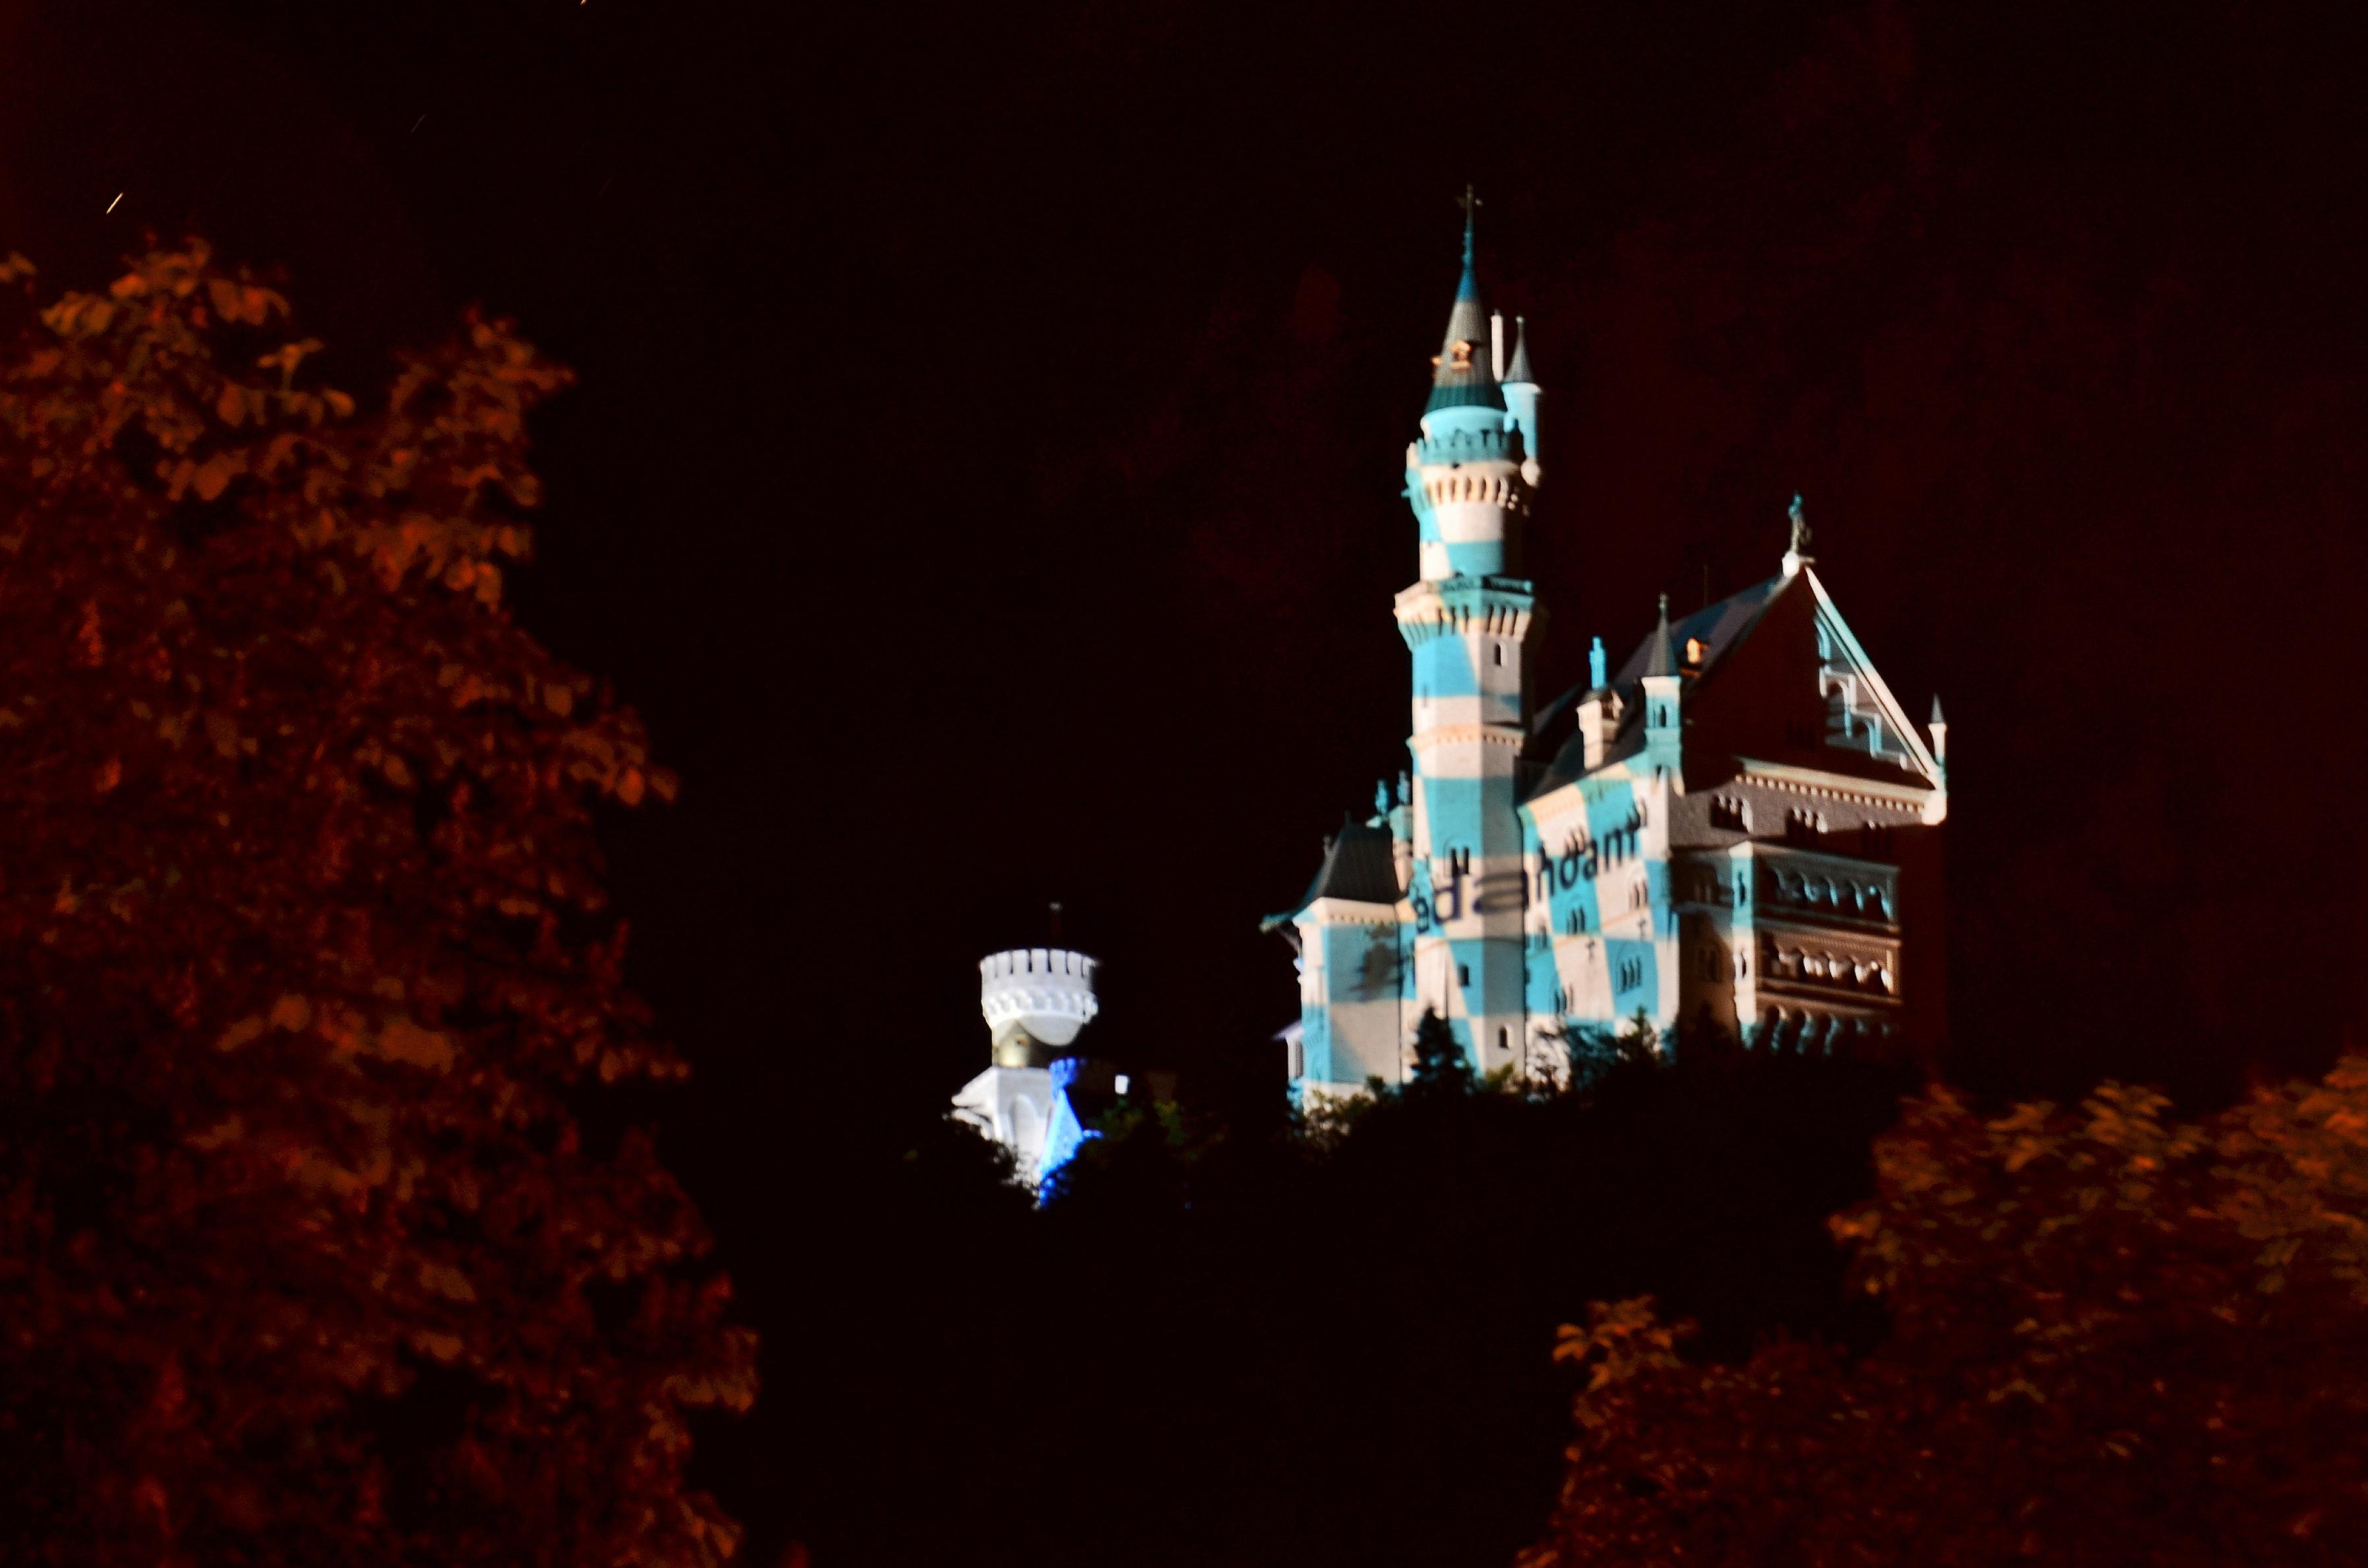 B0056 Schloss Neuschwanstein G7 Gipfelfarben bayr.Flagge m. Werbung.jpg